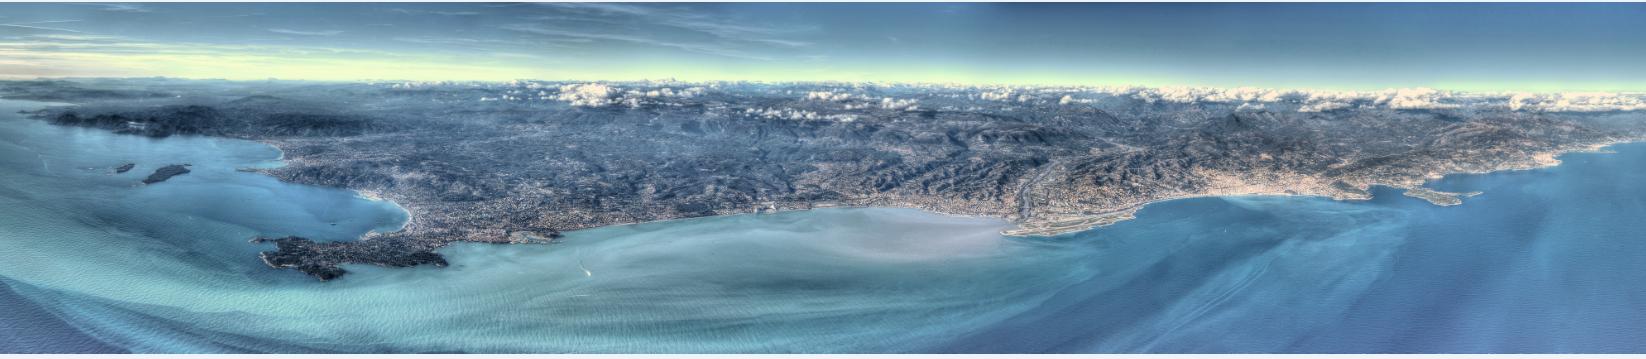 French Riviera Cote Azur Angels Bay Invest